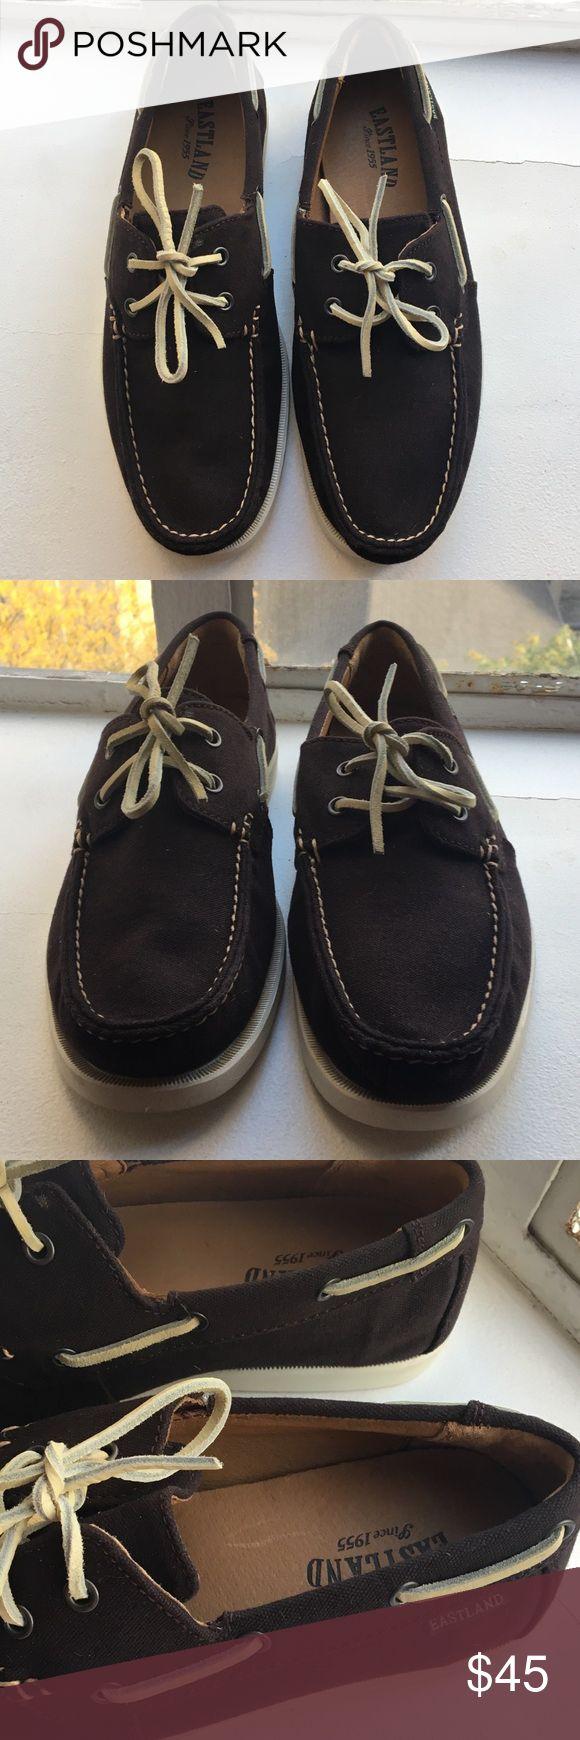 🚣♀️ Eastland Freeport Mens Boat Shoes 9.5 Great Condition! Eastland Mens Boat Shoes Slip-Ons Size 9.5. Canvas Material, Dark Navy or Black Color. 30% off 2 or more items Eastland Shoes Boat Shoes